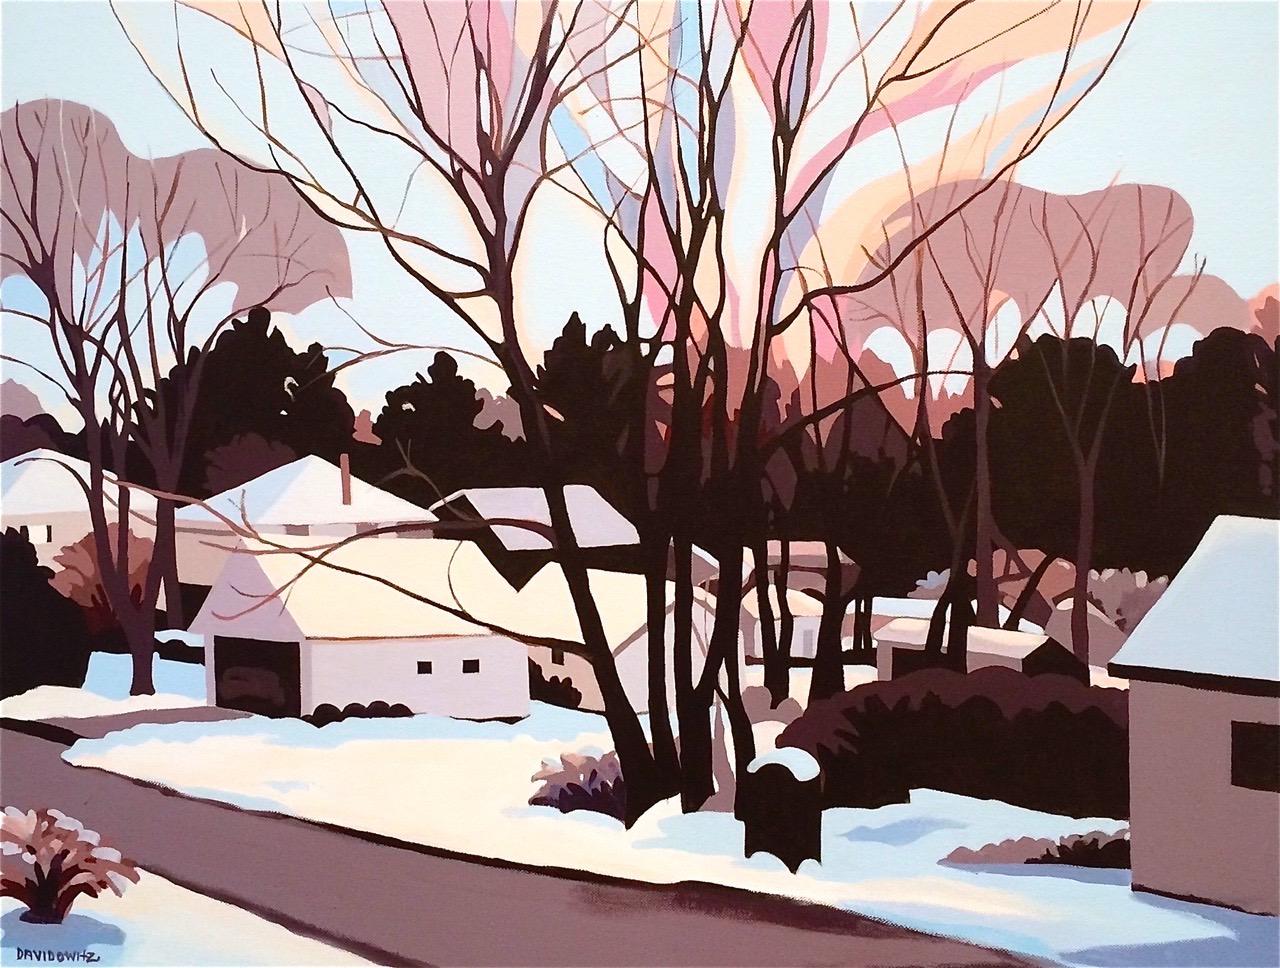 """Sunrise in the Treetops"", acrylic on canvas, 24"" x 30"", copyright 2015 Nina Davidowitz"